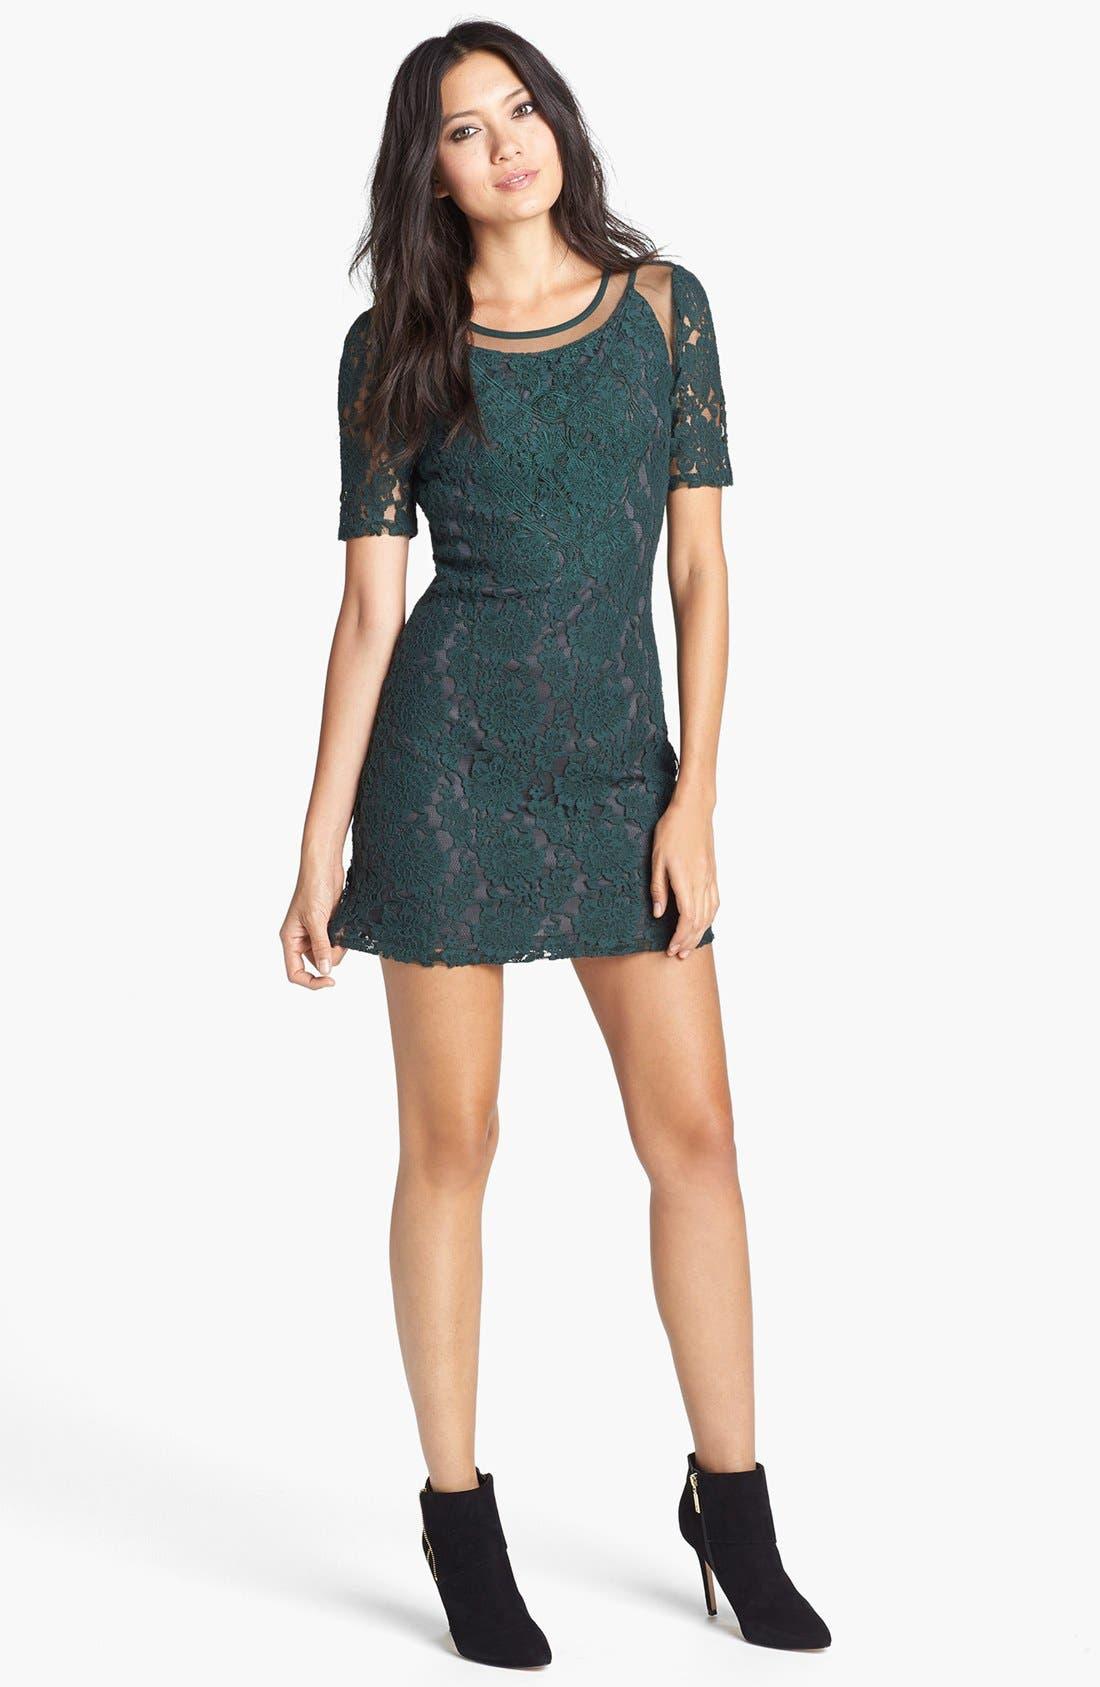 Main Image - ASTR Mesh Inset Lace Dress